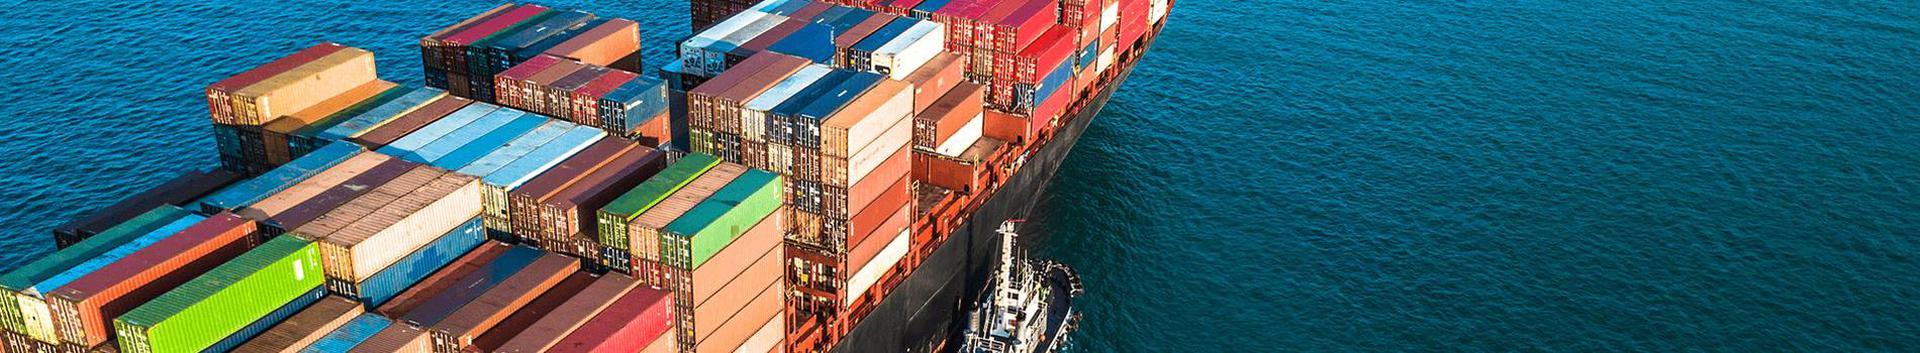 agenteerimine, laevandus, meretransport, transpordi- ja kullerteenused, transporditeenused, Merendus